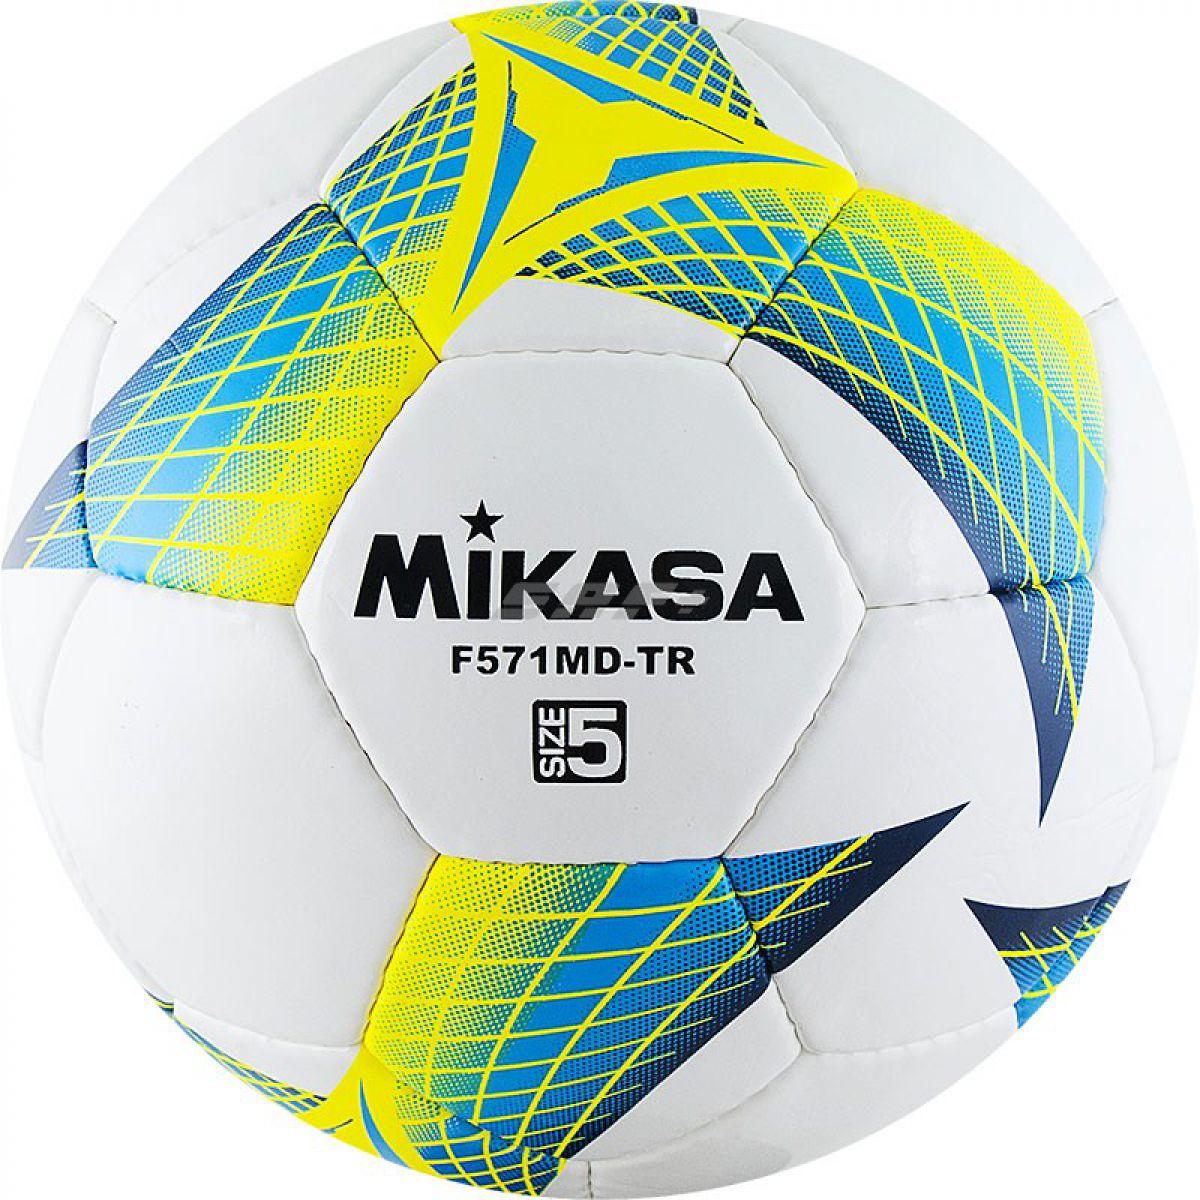 Мяч футбольный MIKASA F571MD-TR-B